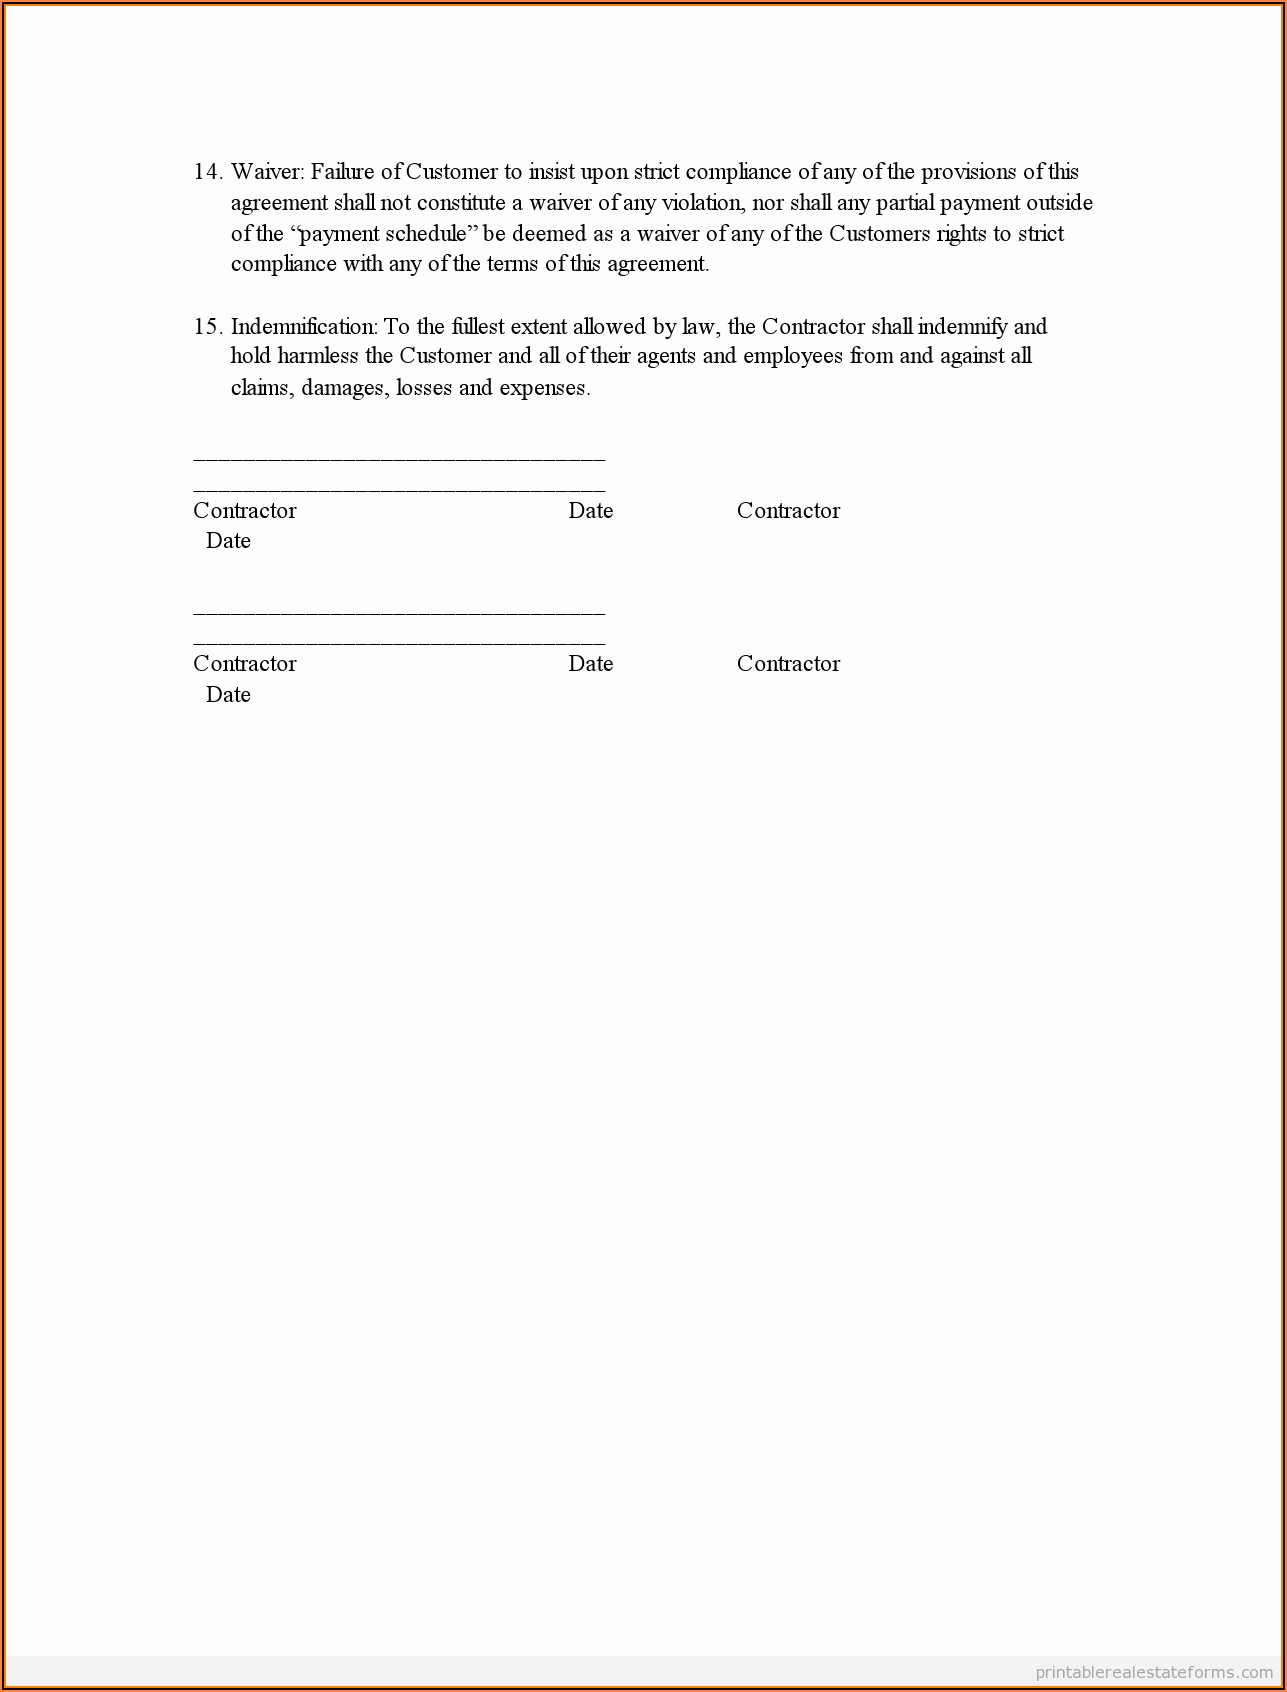 Contractor Agreement Sample Word